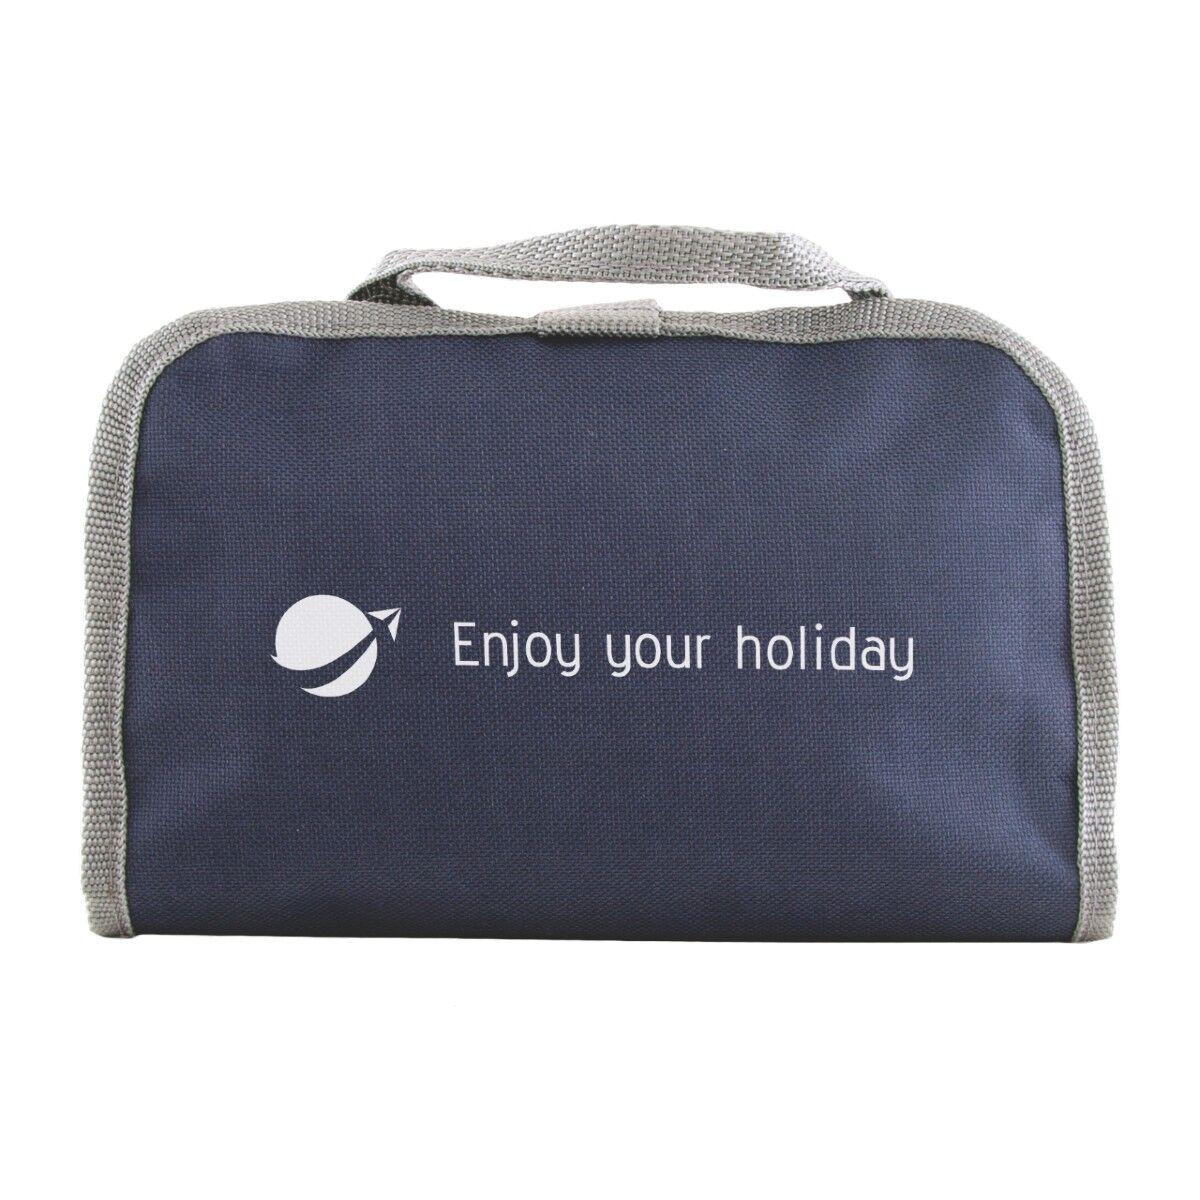 Enterprise Costmetics Travel Bag Navy